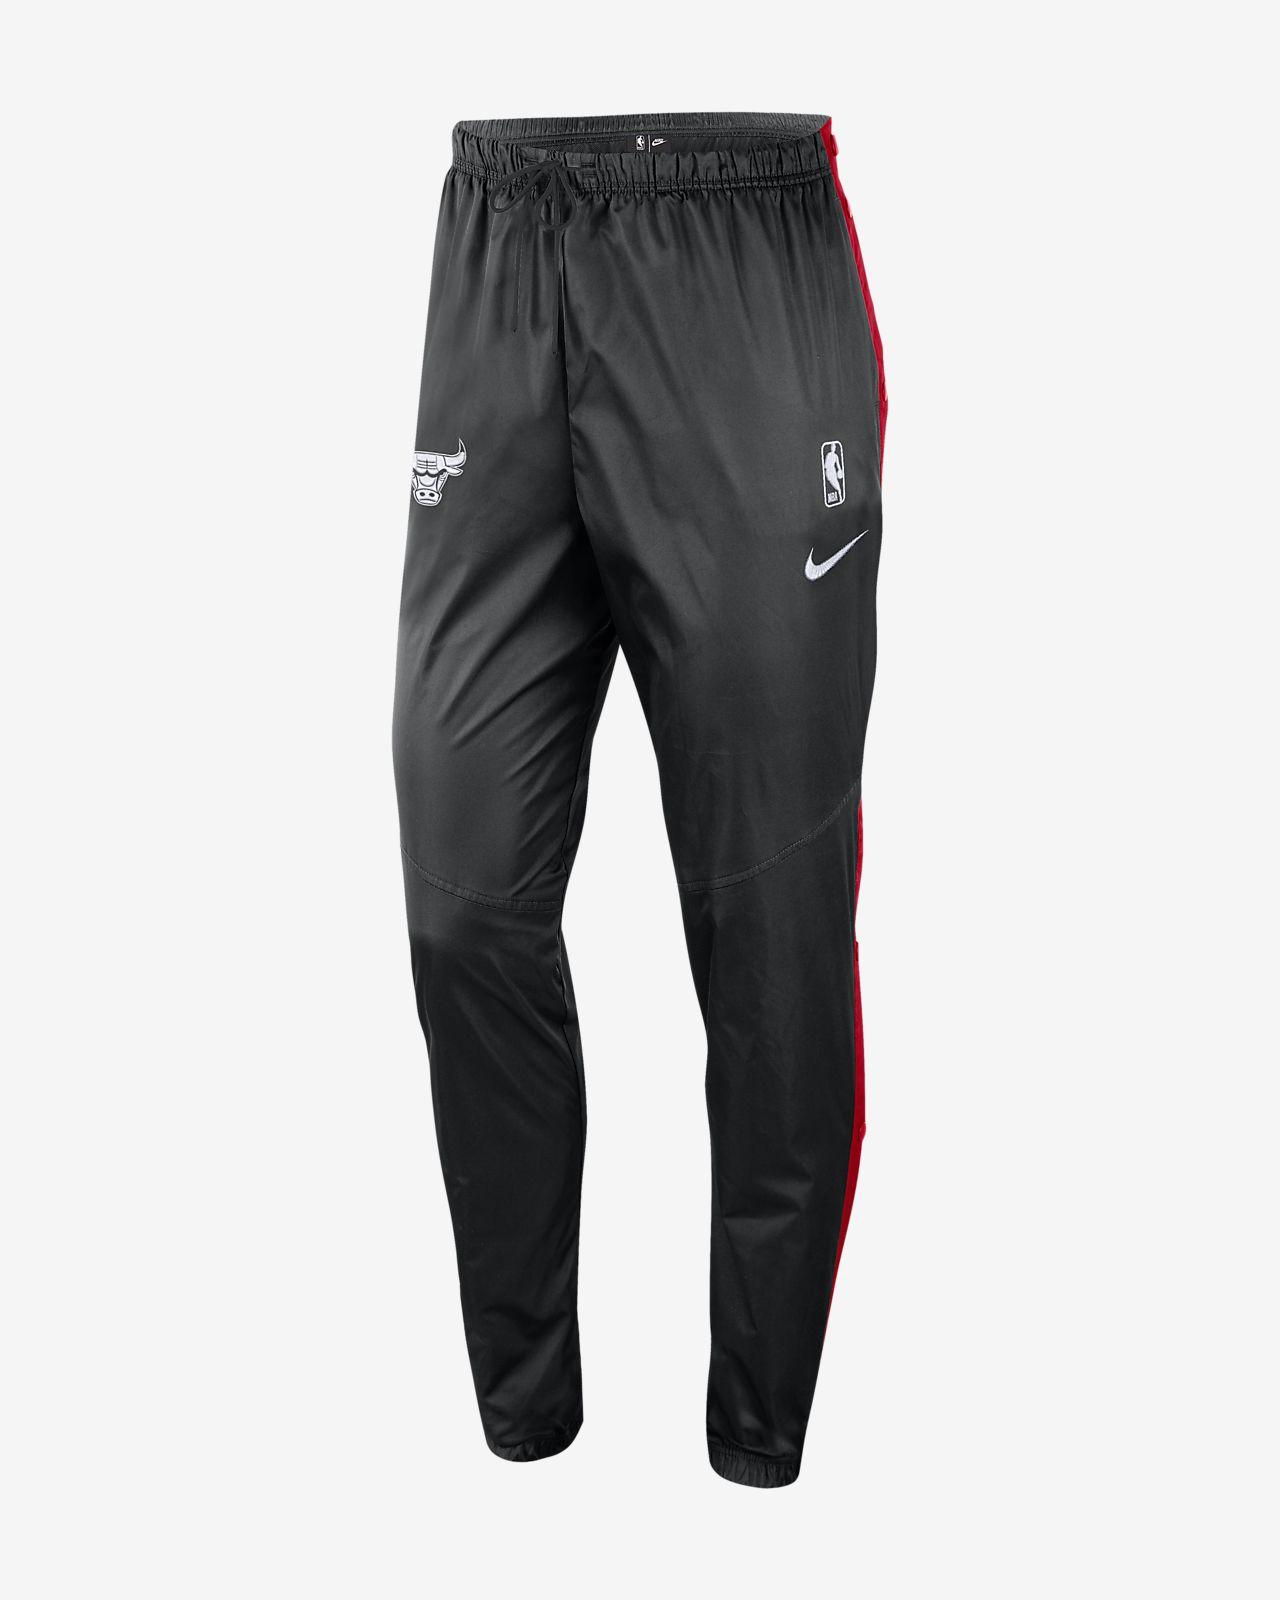 Pantalon Femme Chicago Bulls Pour Nike Nba zMpSUqV